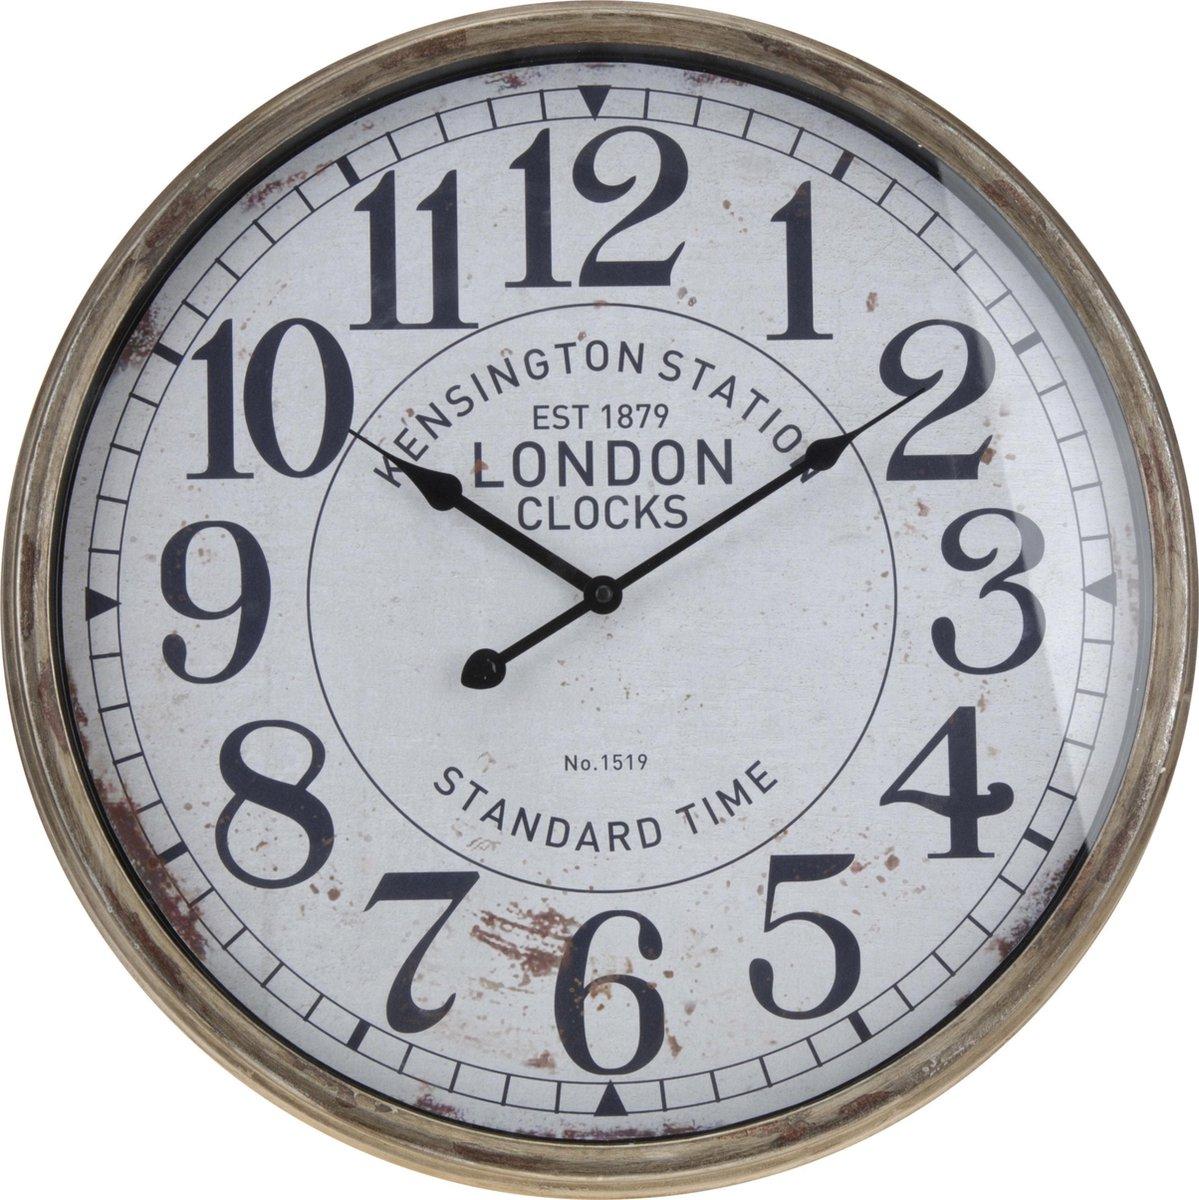 Wandklok London Kensington Station - Metaal | Grote Muurklok 50 cm - London's Times